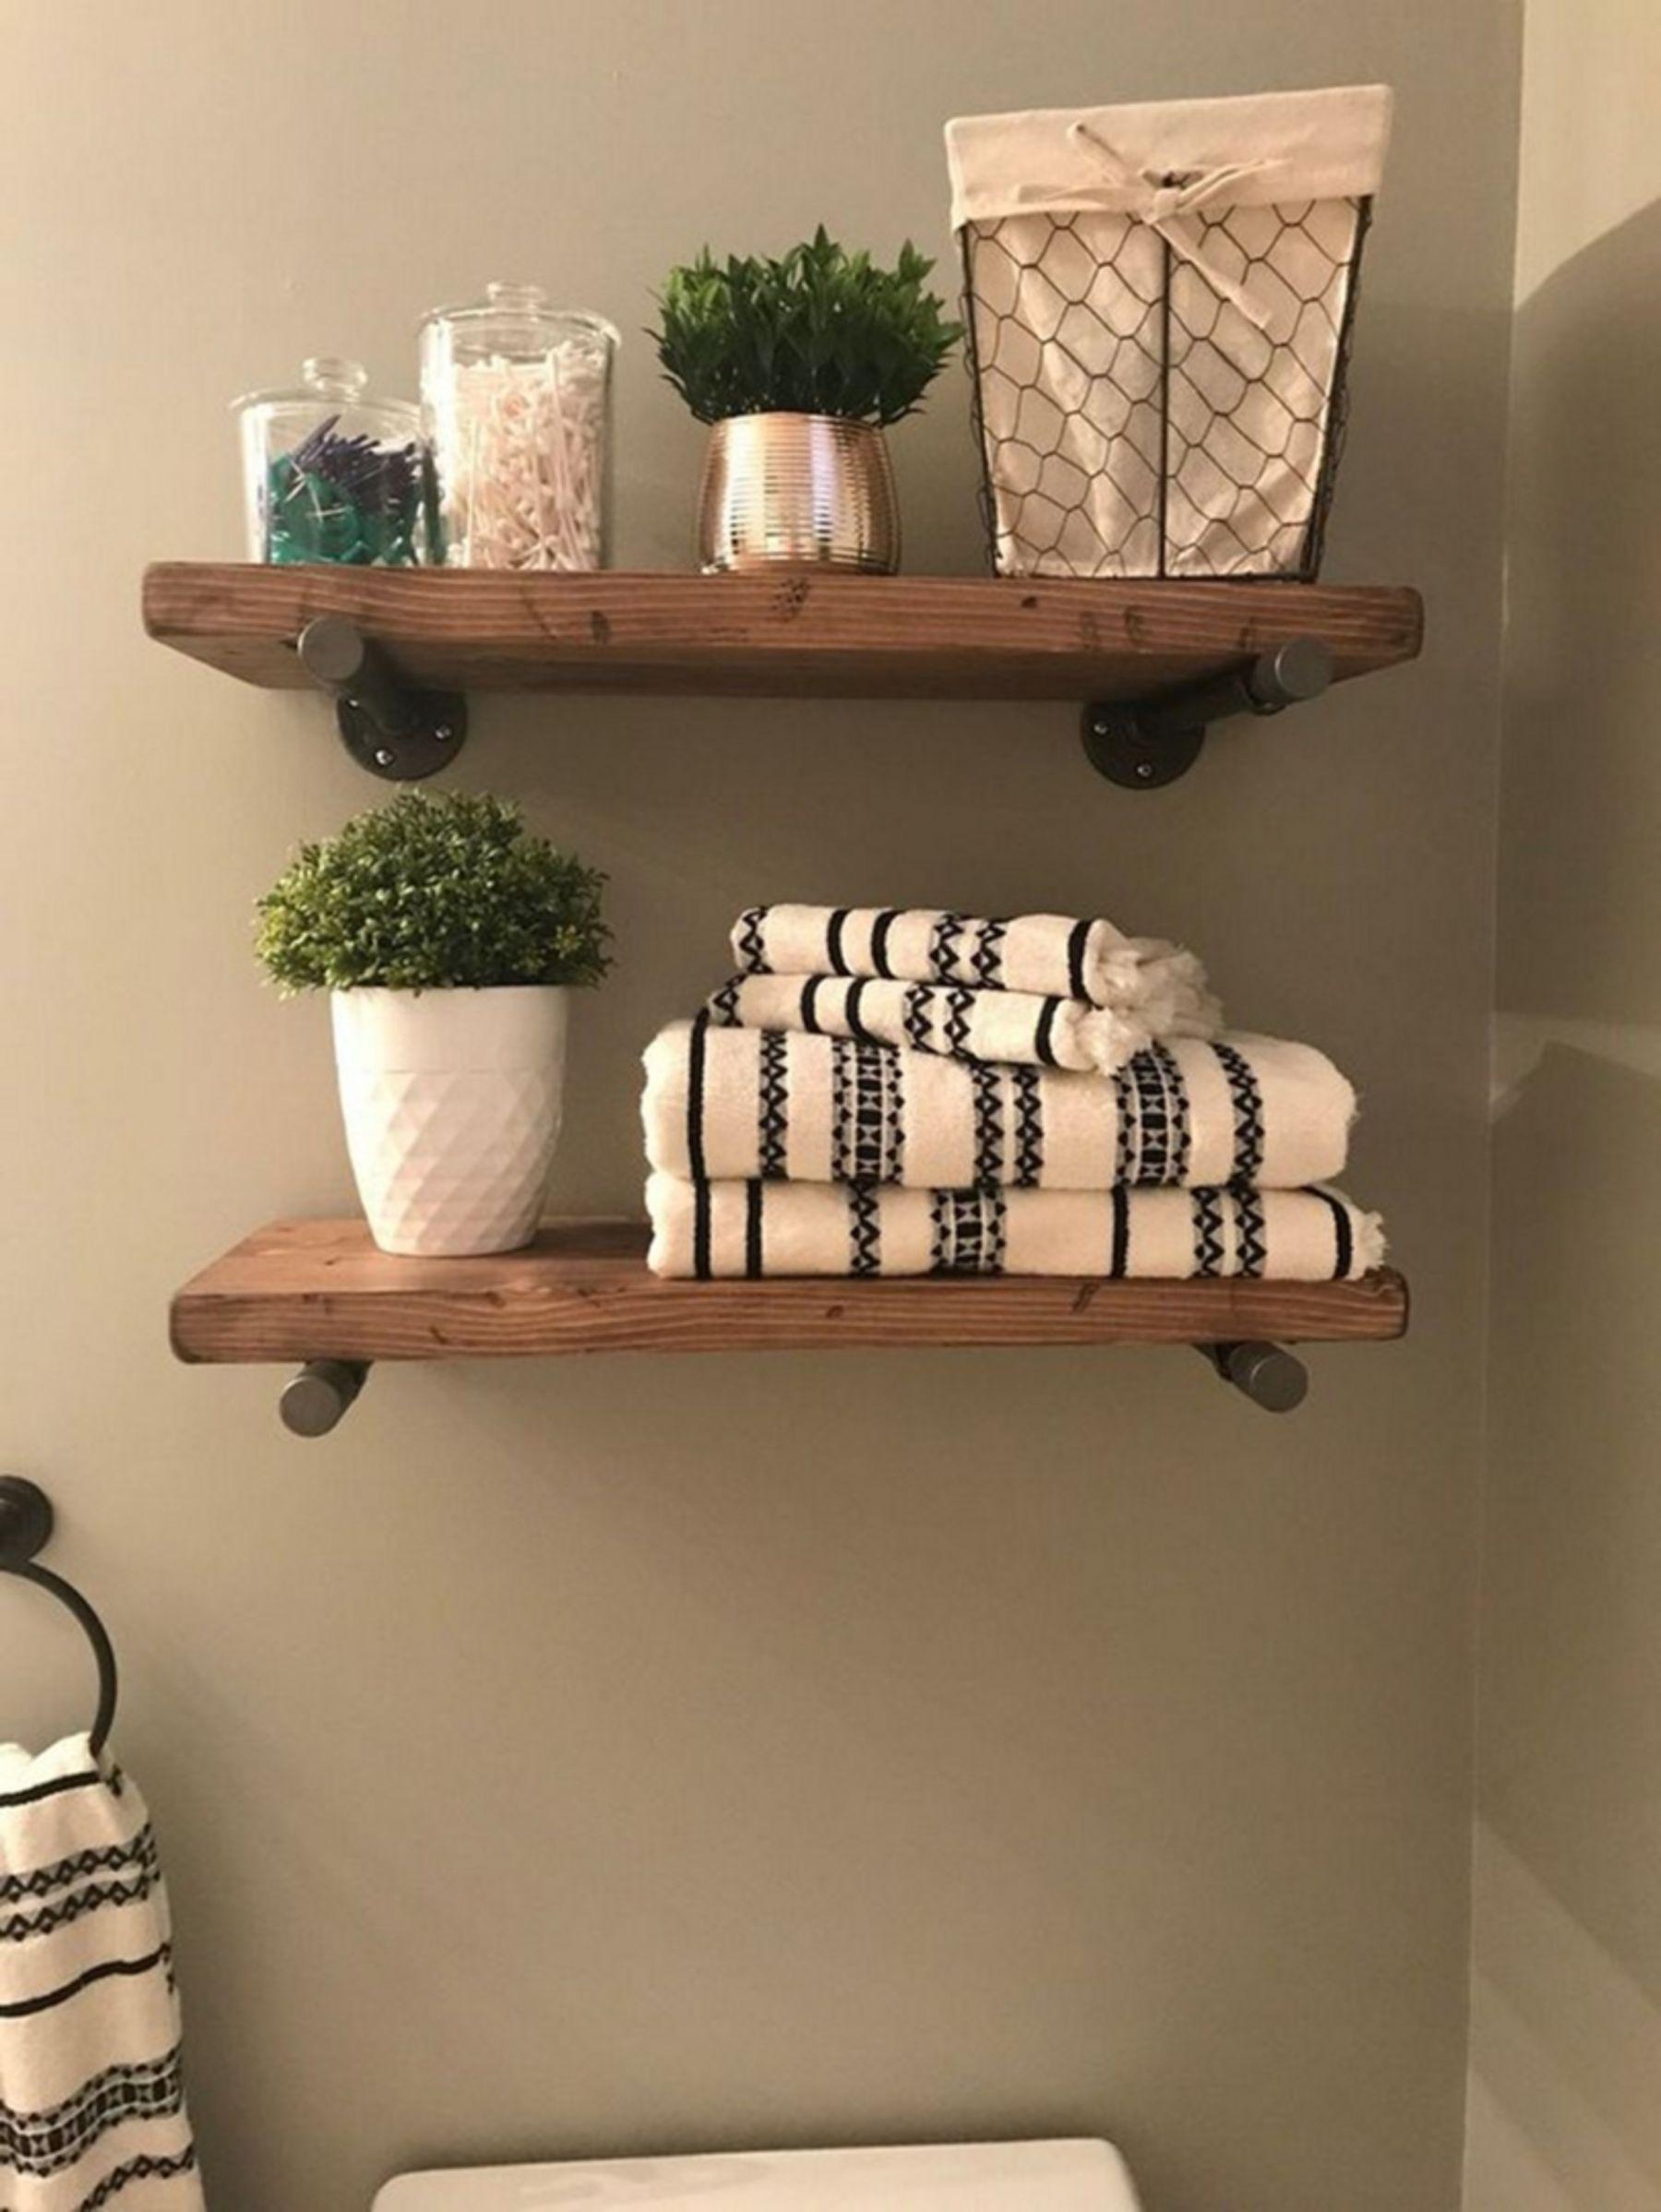 10 Simple And Cheap Diy Wooden Shelf Design Ideas For Your Bathroom Comfort Farmhouse Bathroom Decor Floating Shelves Diy Home Decor